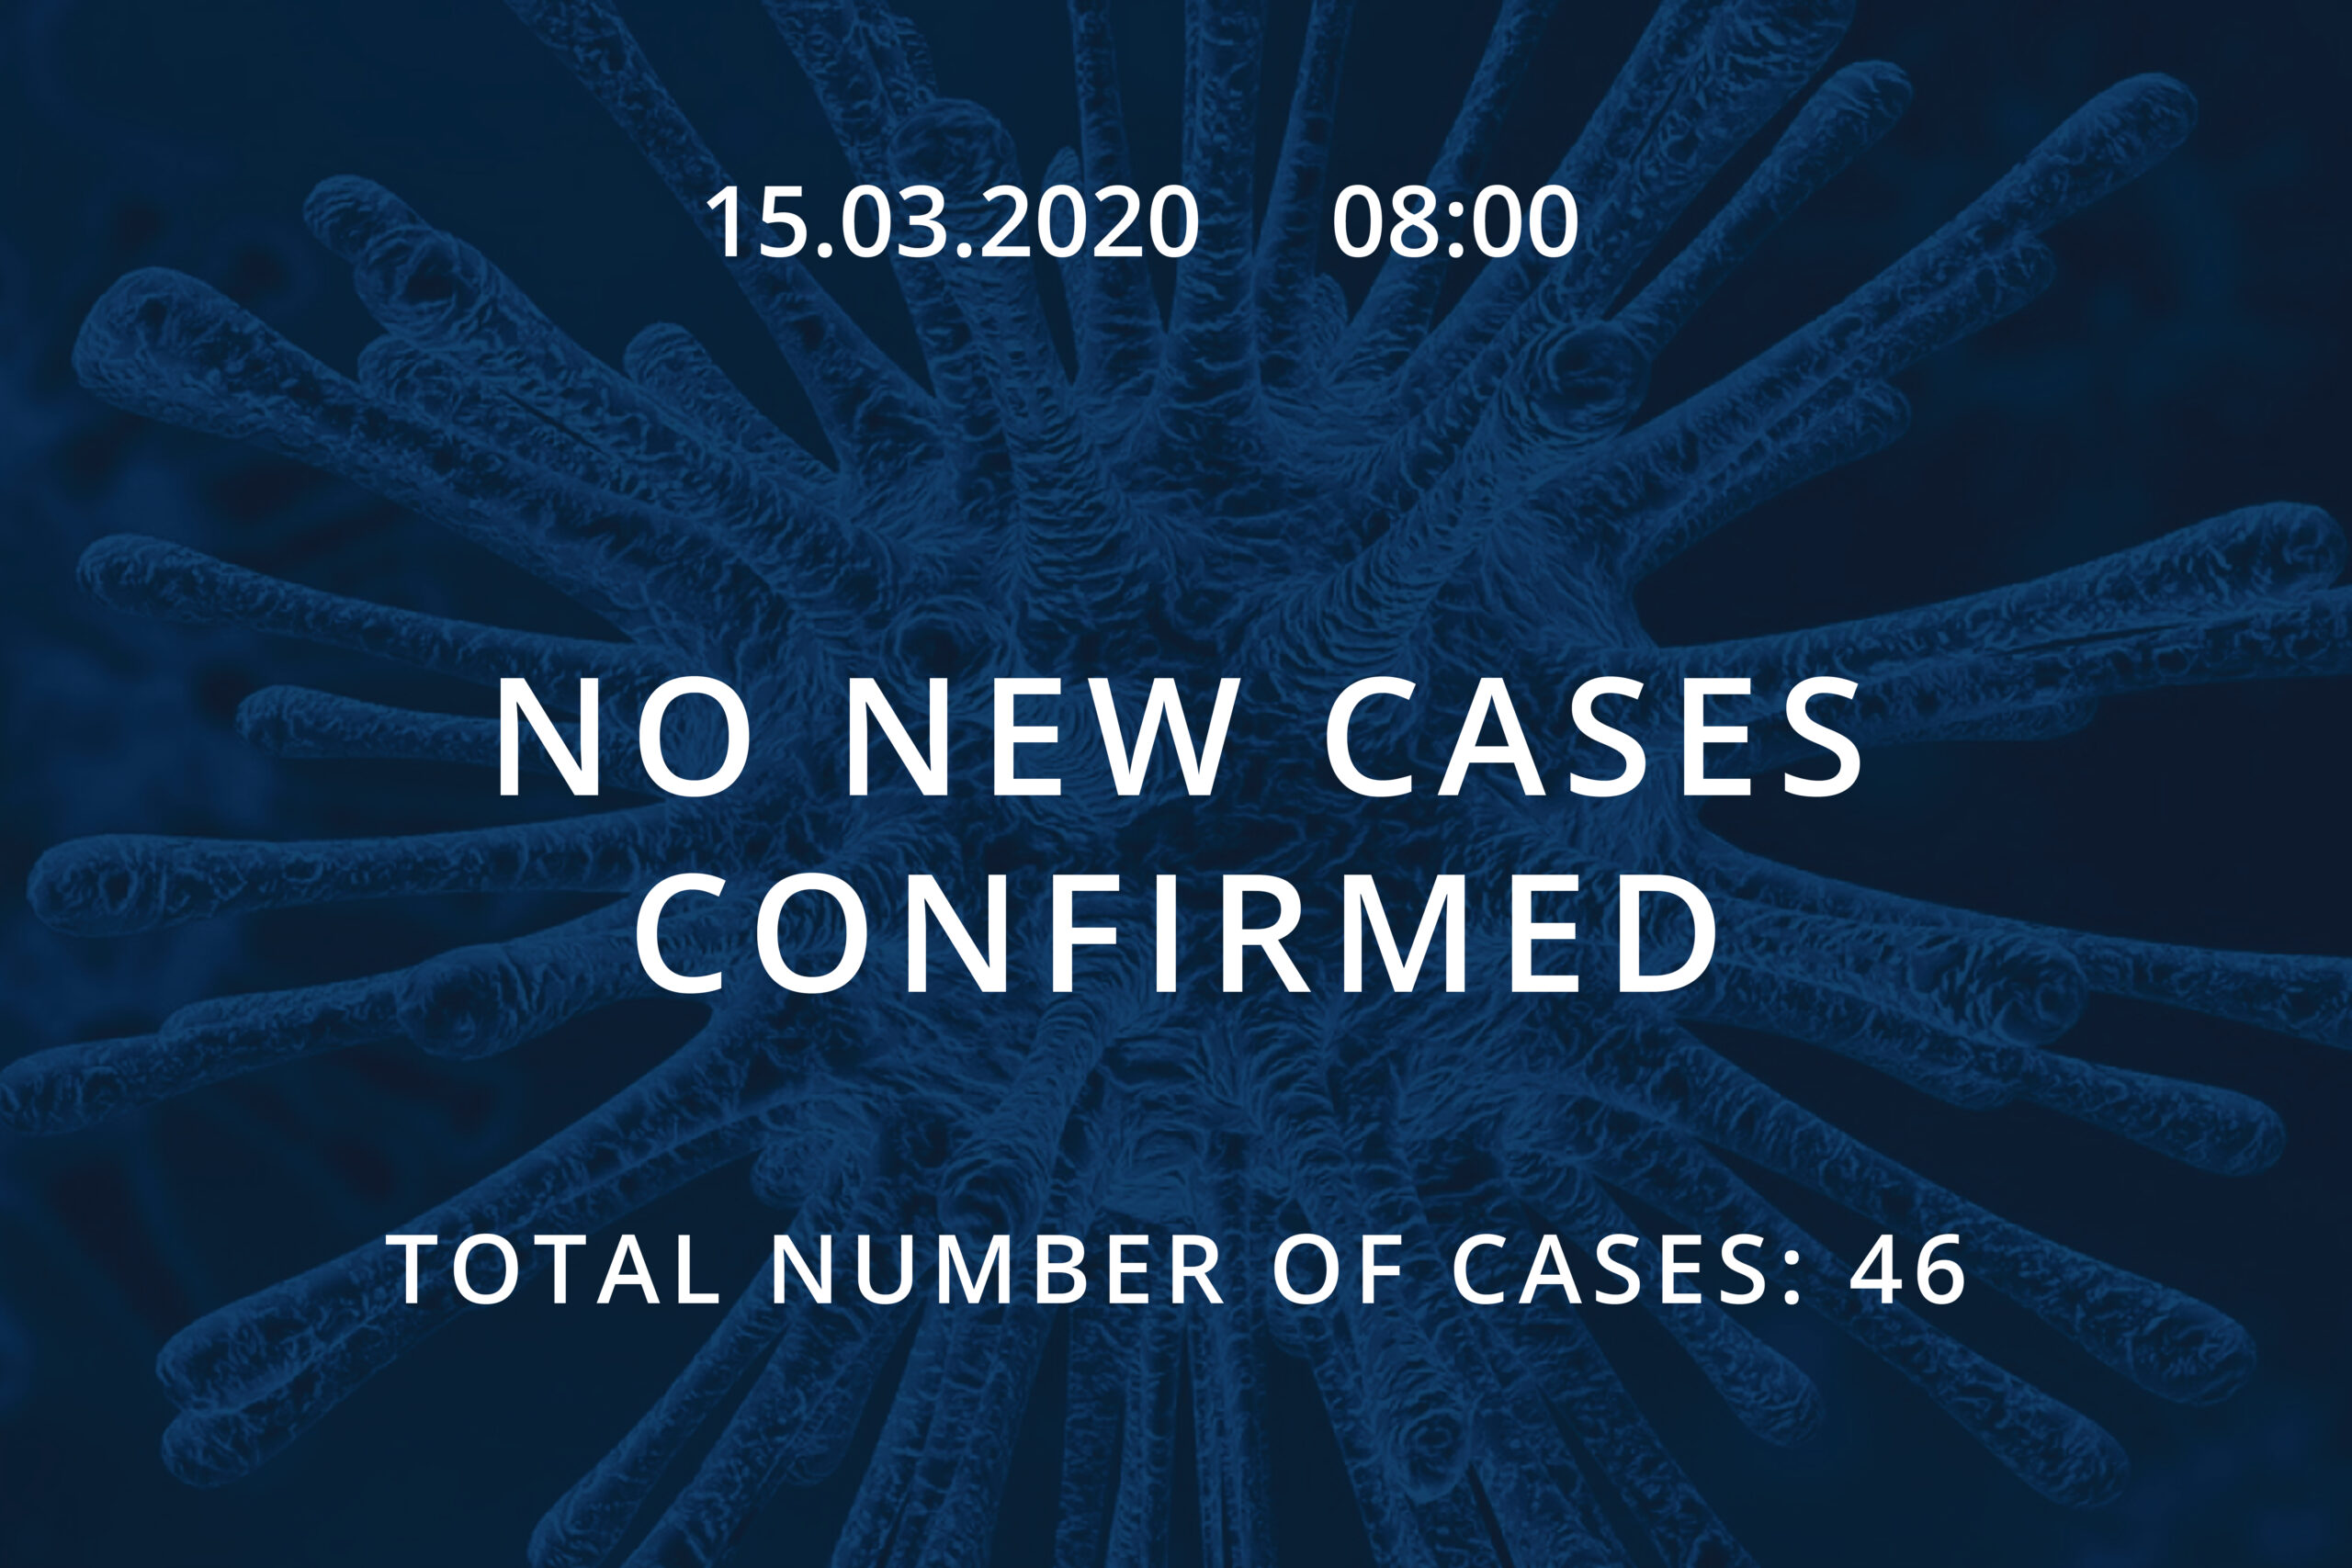 Information about coronavirus COVID-19, 15.03.2020 at 08:00